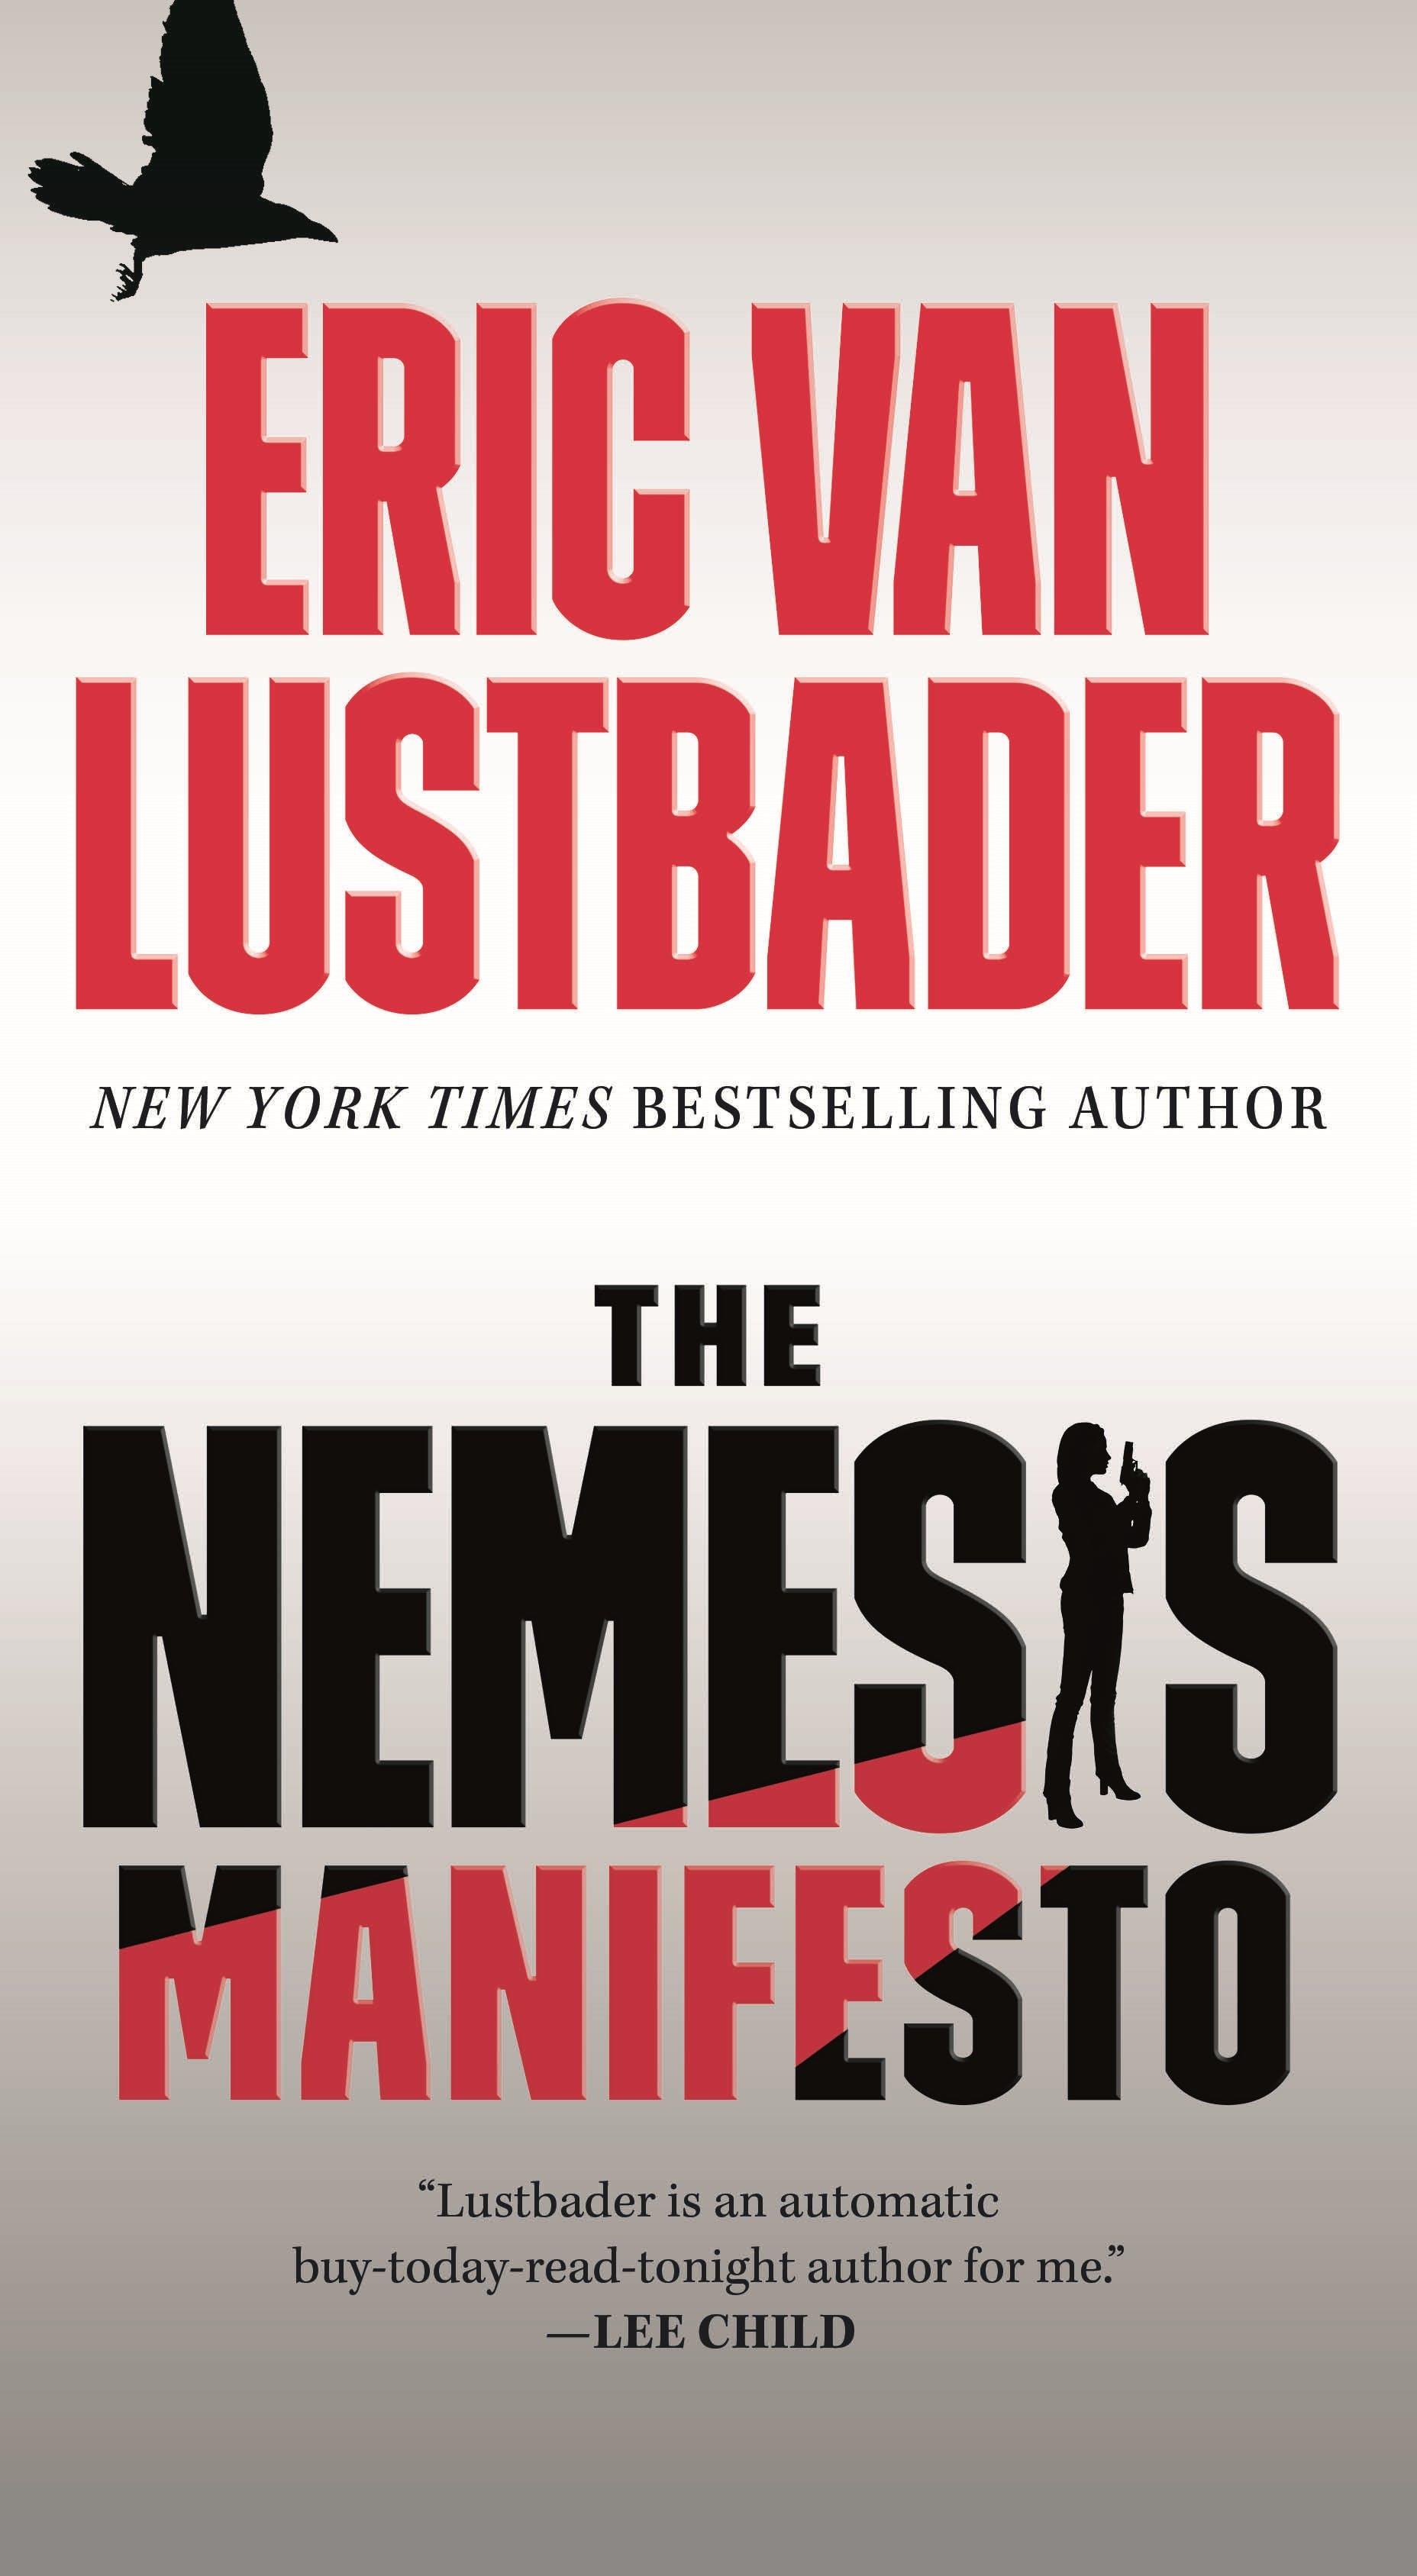 Image of The Nemesis Manifesto